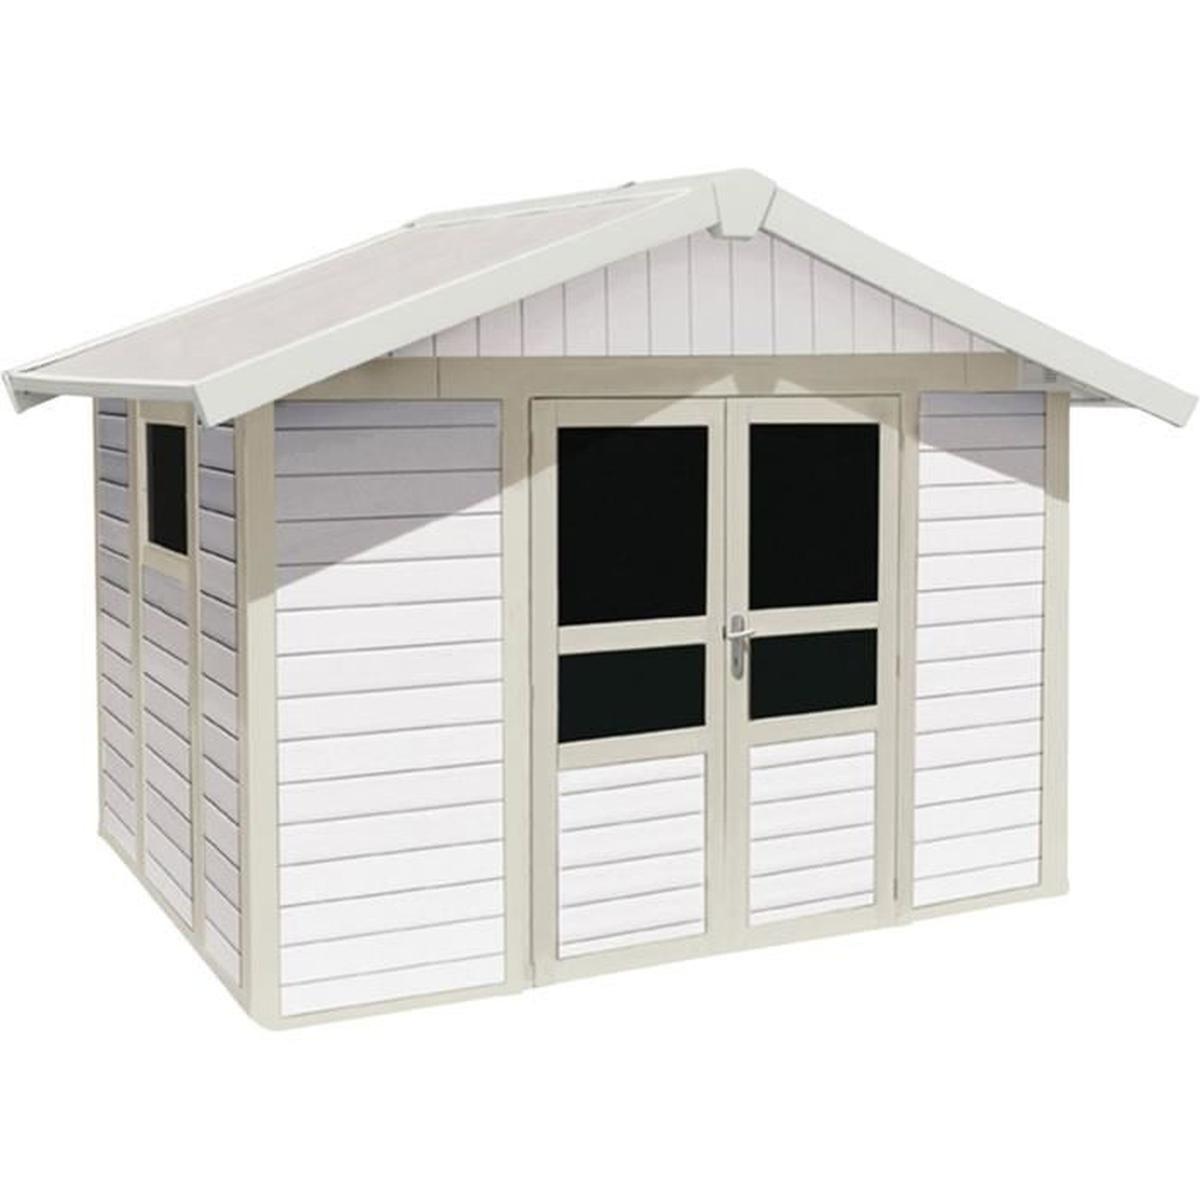 Basic Home Abri De Jardin Grosfillex Blanc En Pvc 11M² ... dedans Abri Jardin Grosfillex